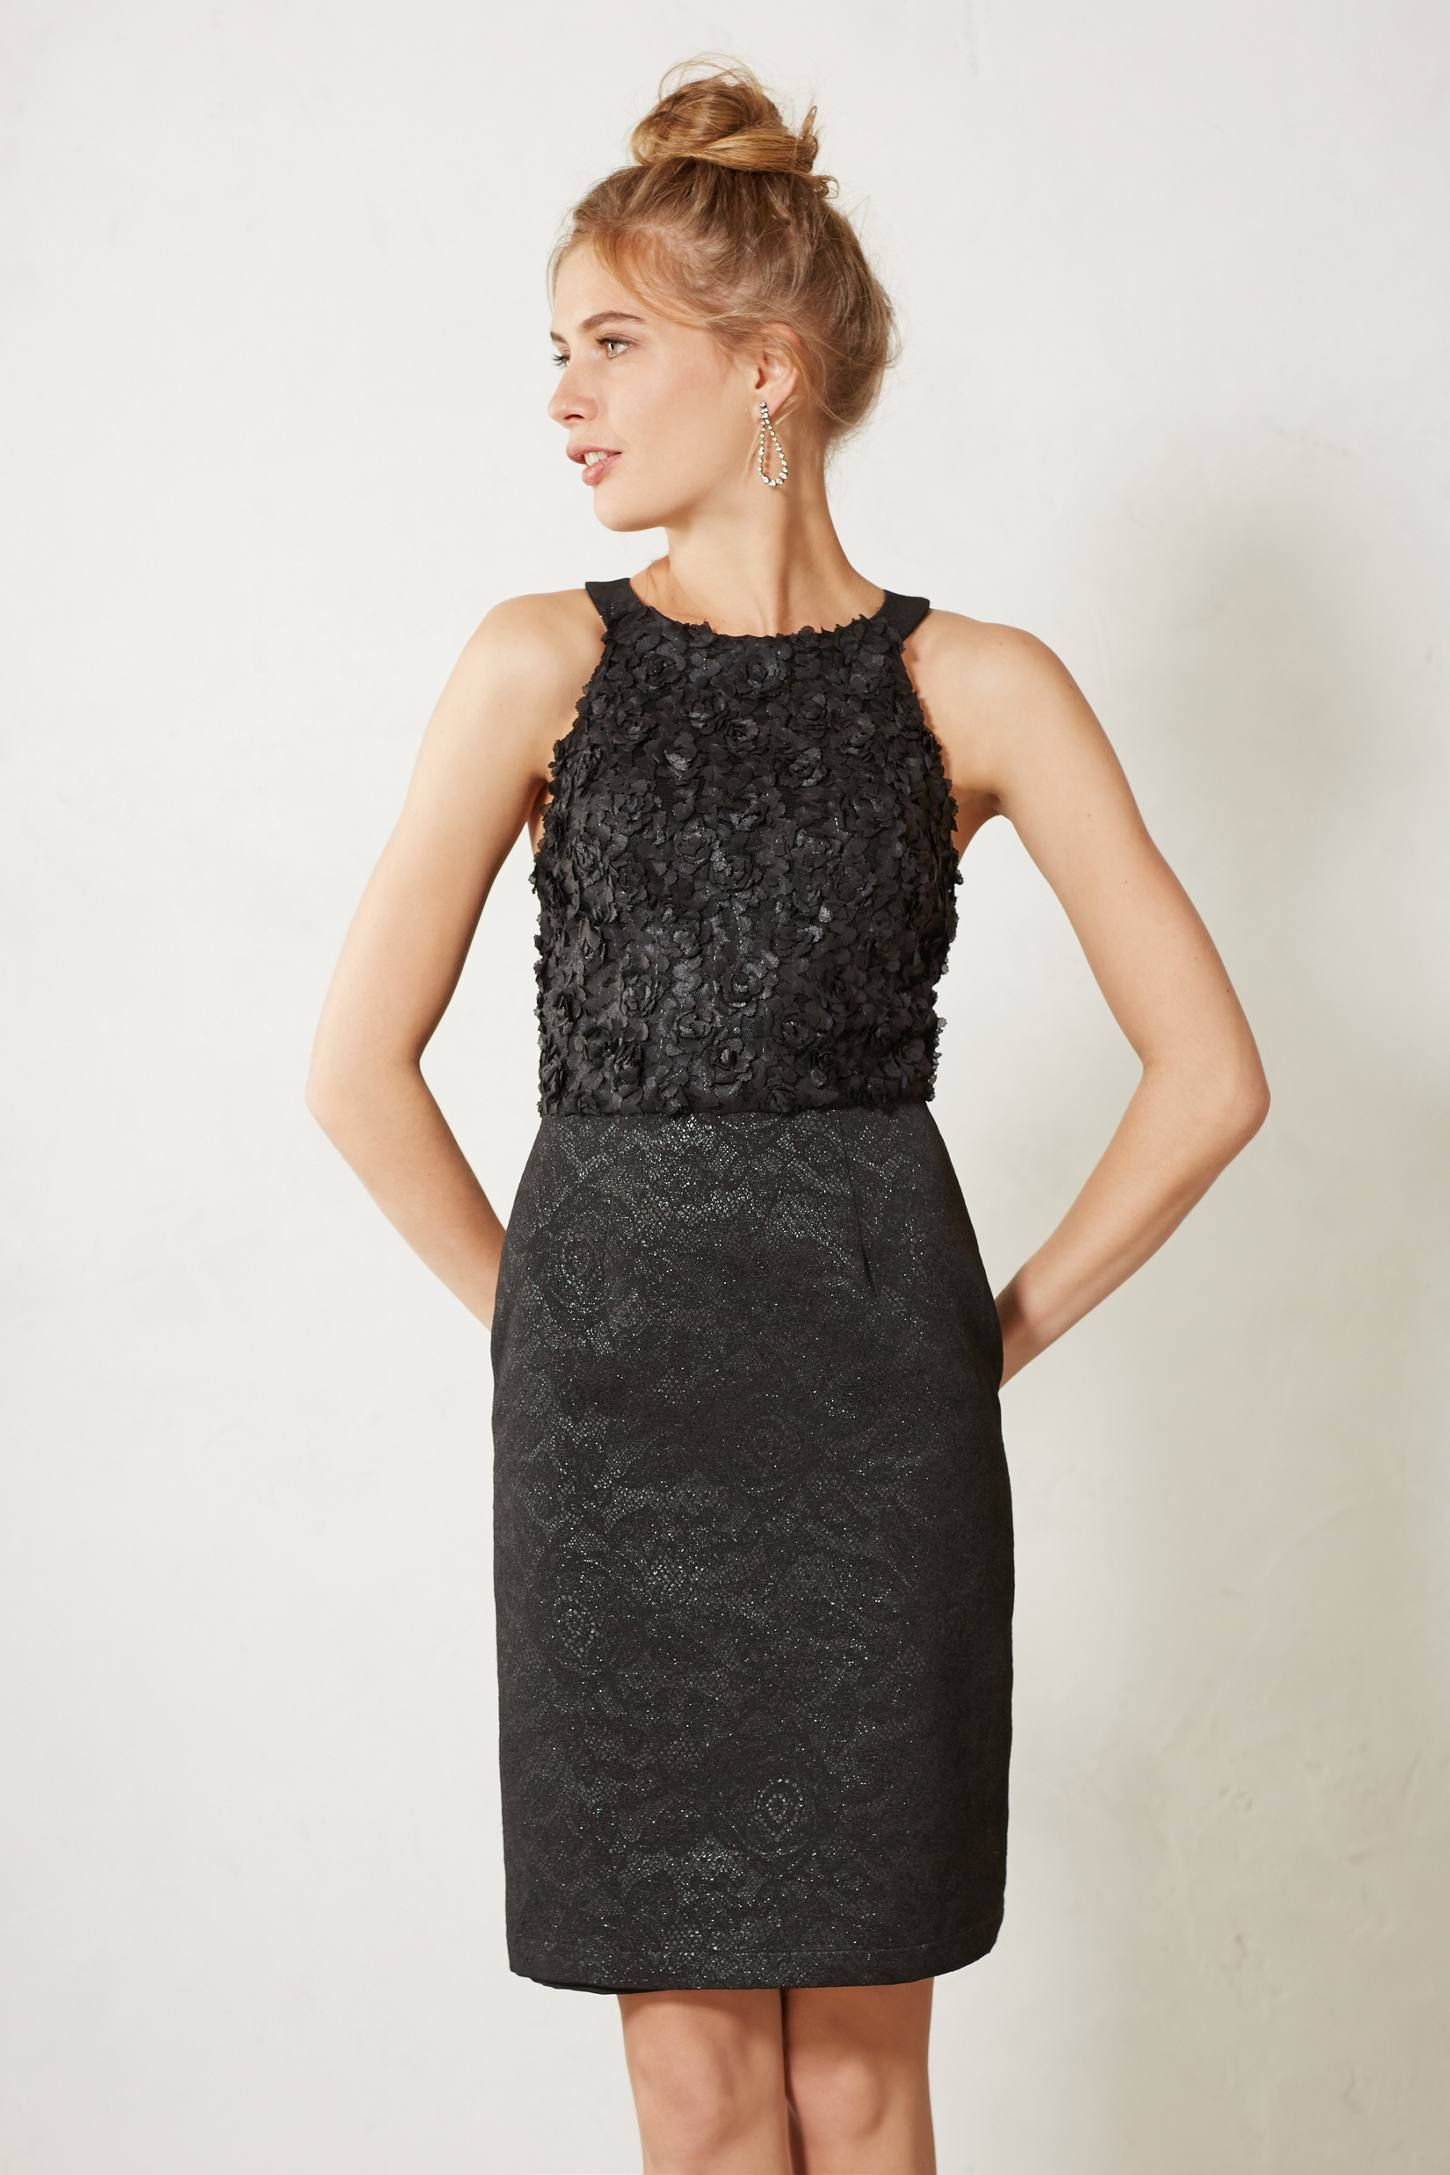 8214f2690c47 Rosebud Pencil Dress | Oh, Audrey. | Pencil dress, Dresses ...